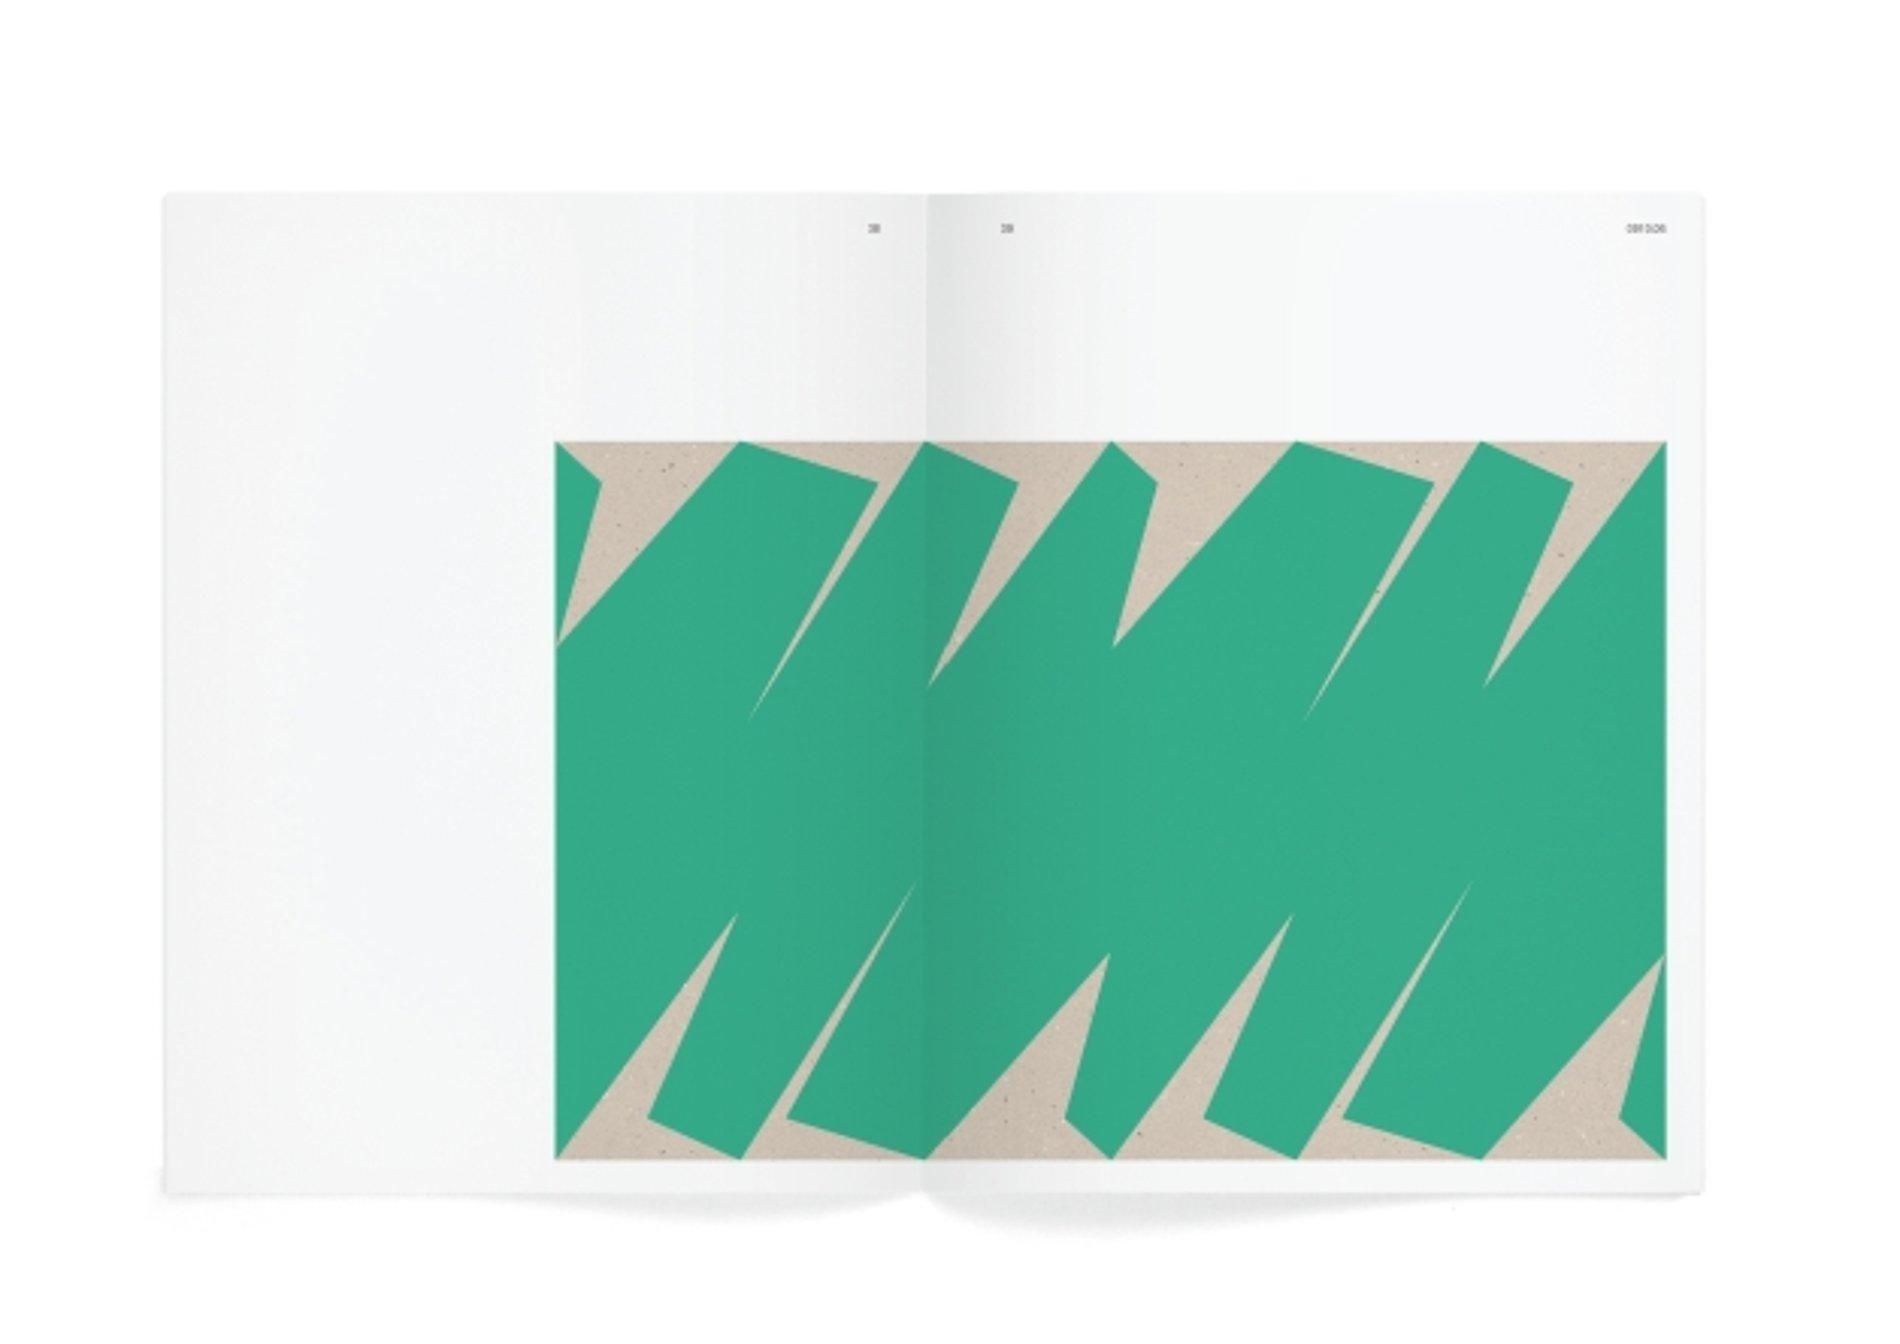 Jupp Gauchel – Rhythm & Greens   Red Dot Design Award